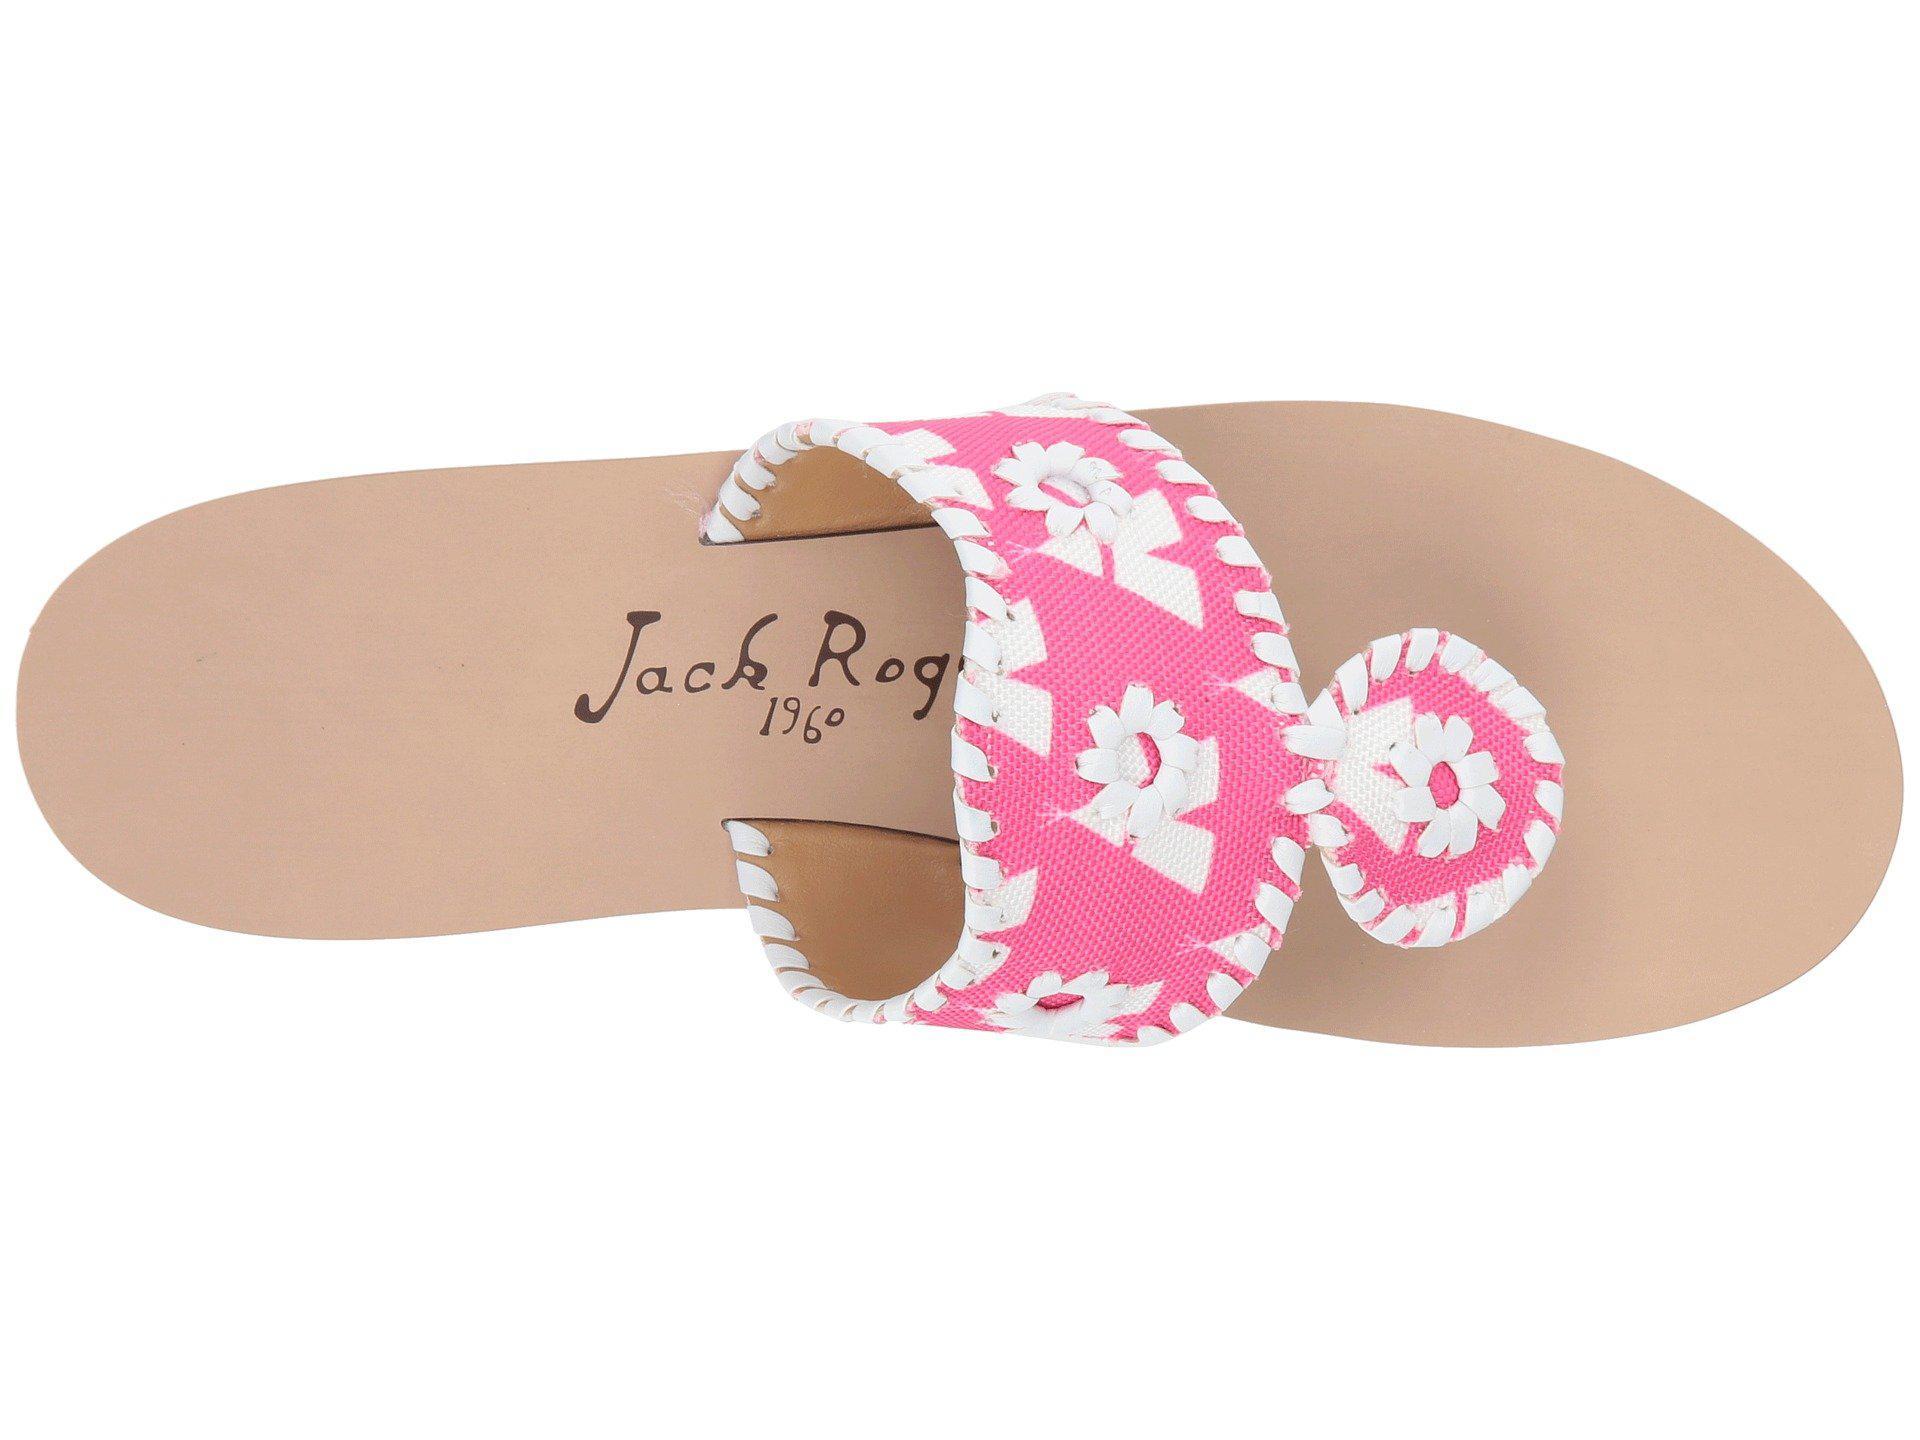 7350c532c8477 Lyst - Jack Rogers Captiva in Pink